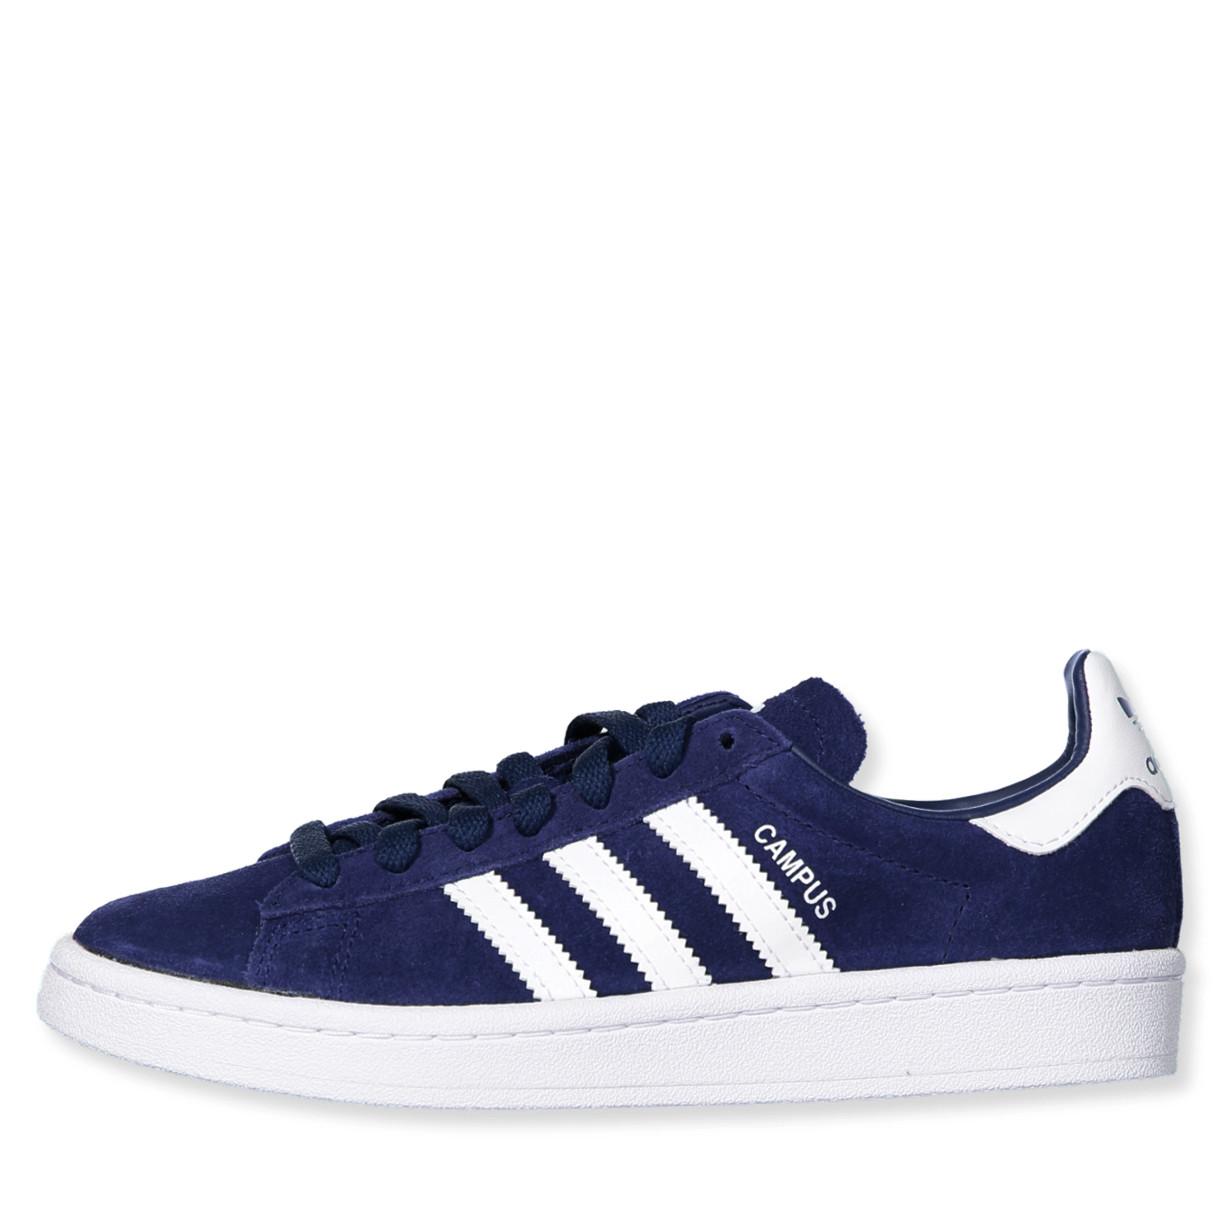 Campus J sneakers